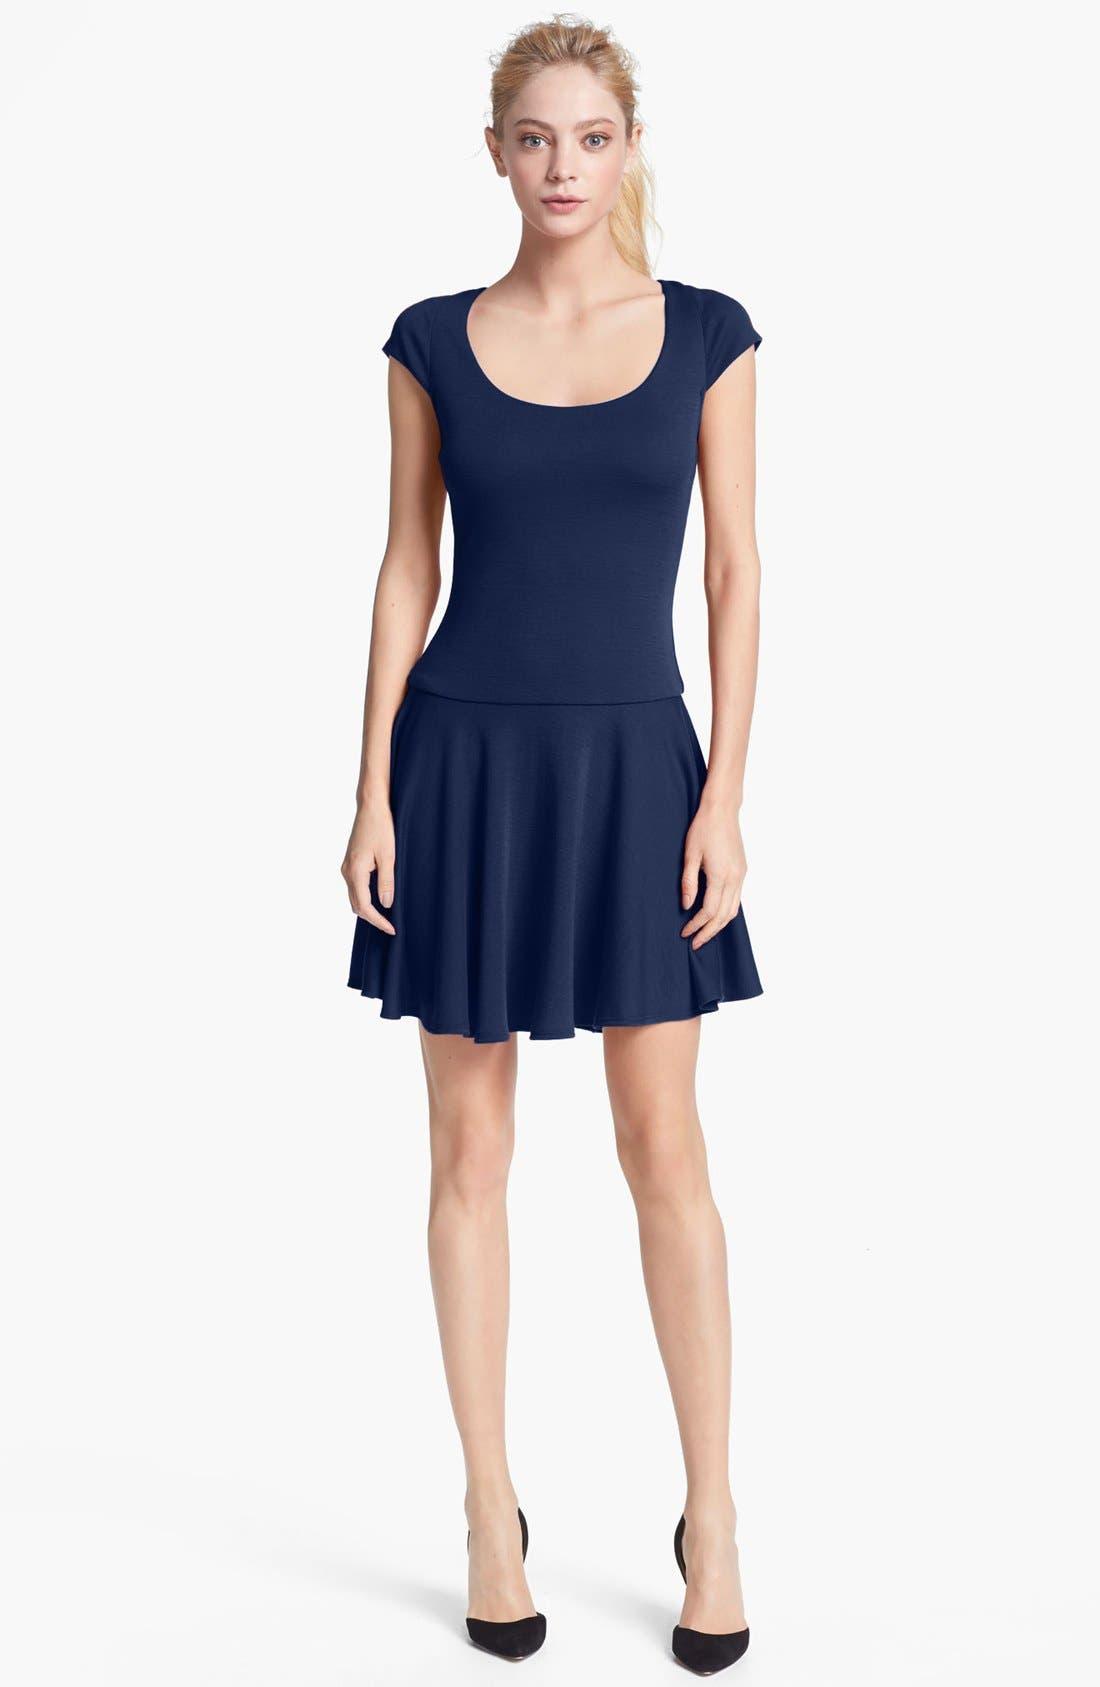 Main Image - Alice + Olivia 'Rylie' Fit & Flare Dress